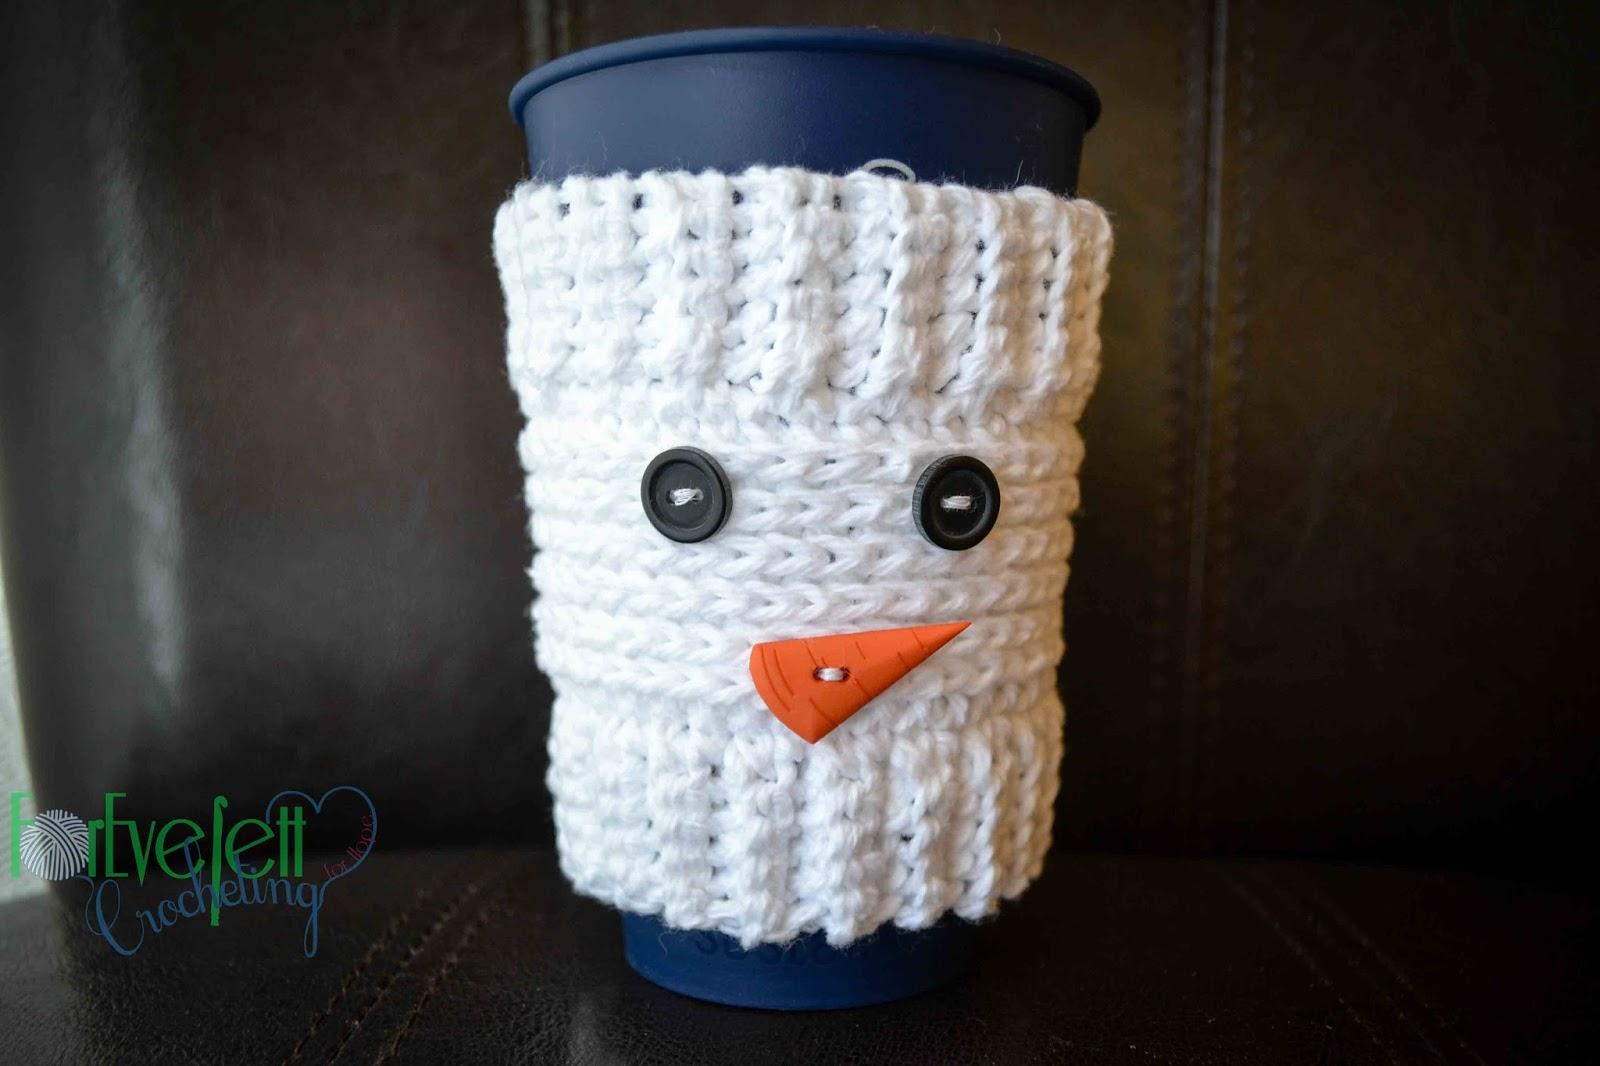 ForeverettCrocheting: Free Snowman Cup Cozy Crochet Pattern